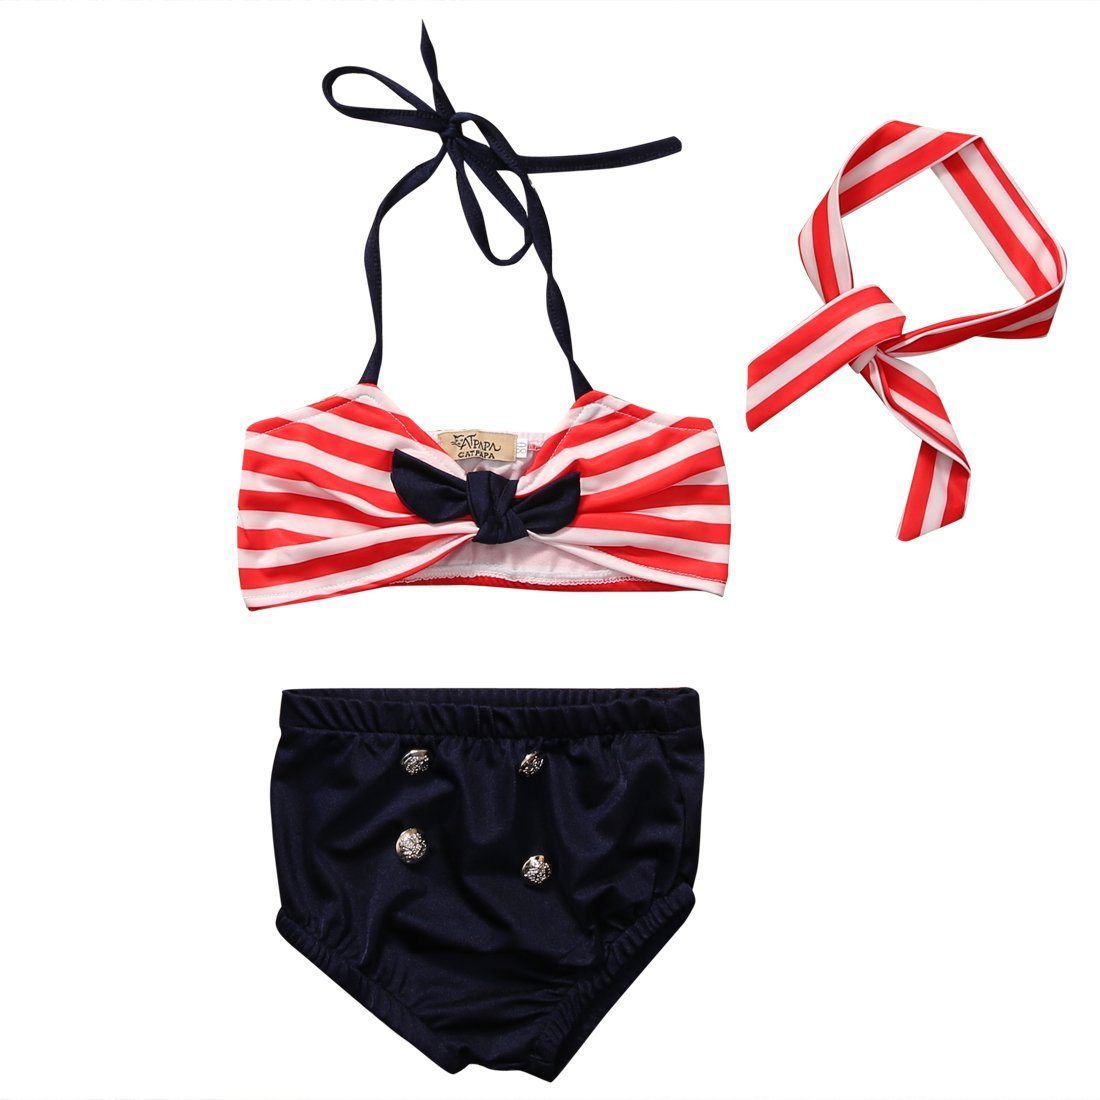 hirigin Baby Girls 3 Pcs Swimwear Striped Halter Bow Top+Bottom+Headband Swimsuit FT16054